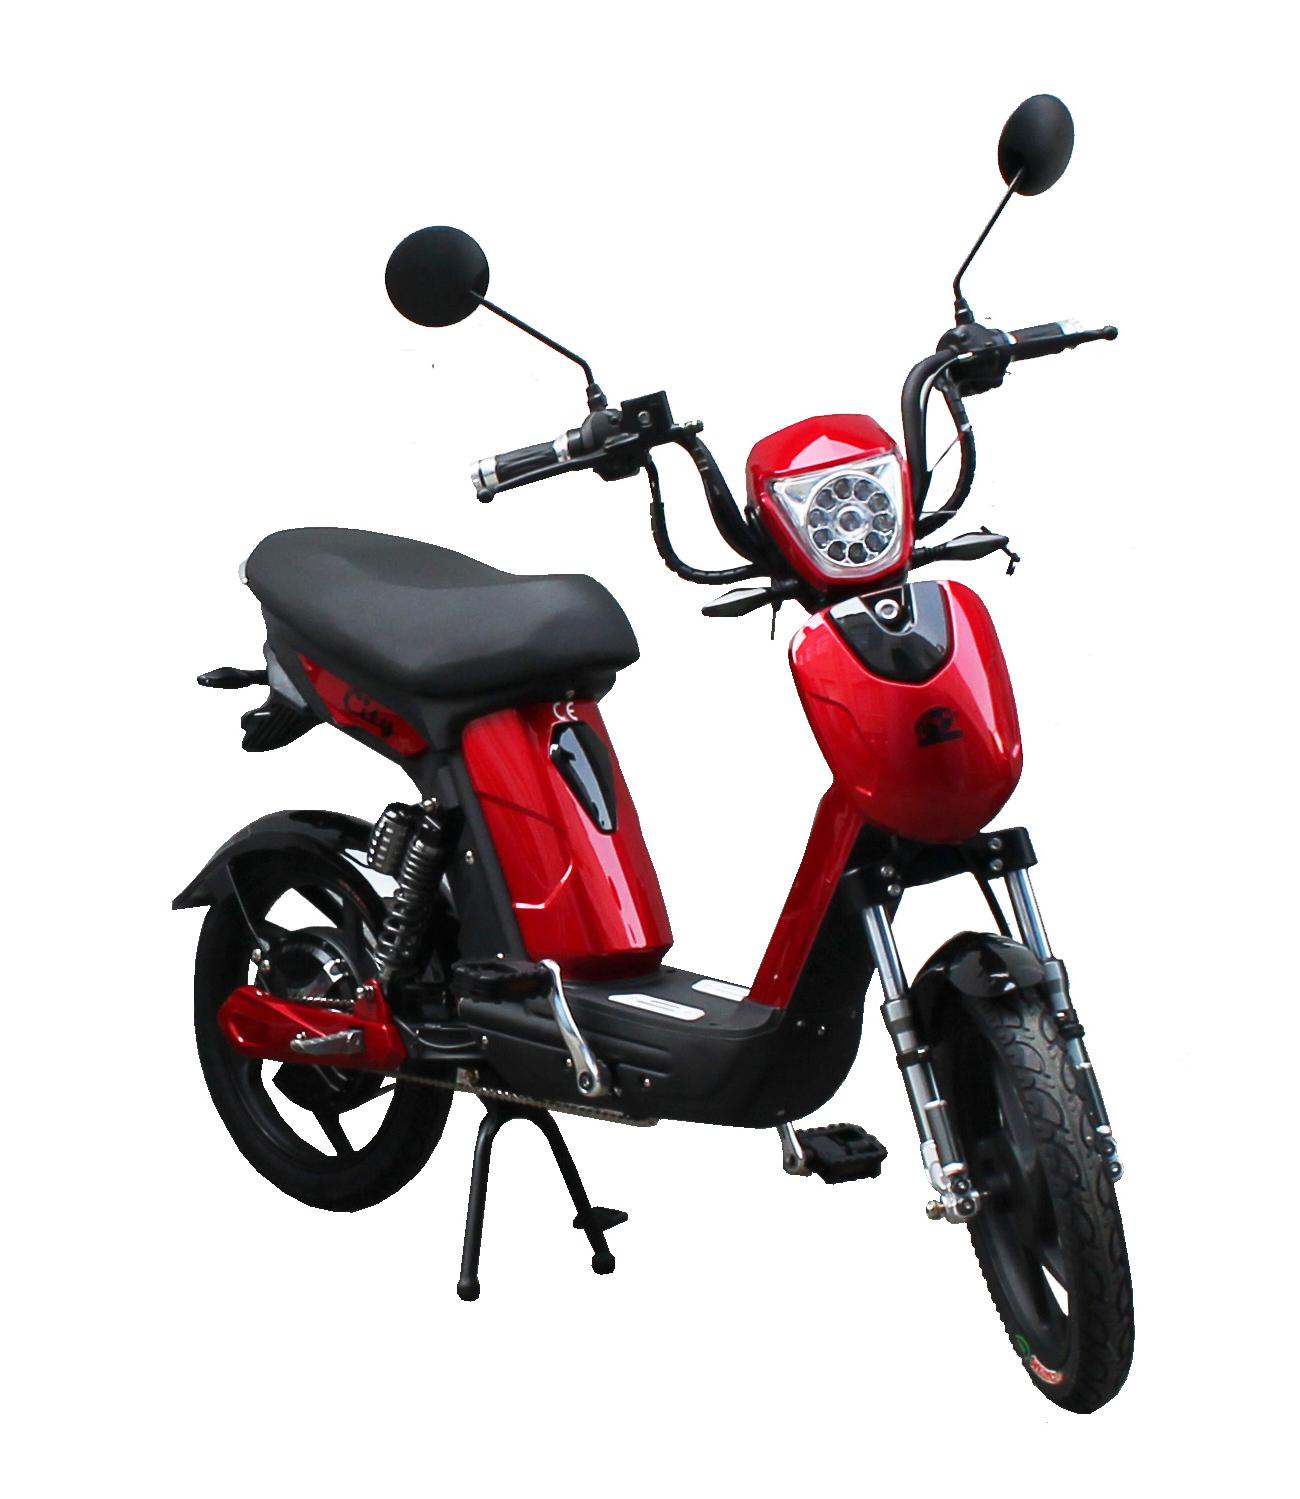 Bici E-Bike / E-Fahrrad / Elektrofahrrad City rot Bild 1